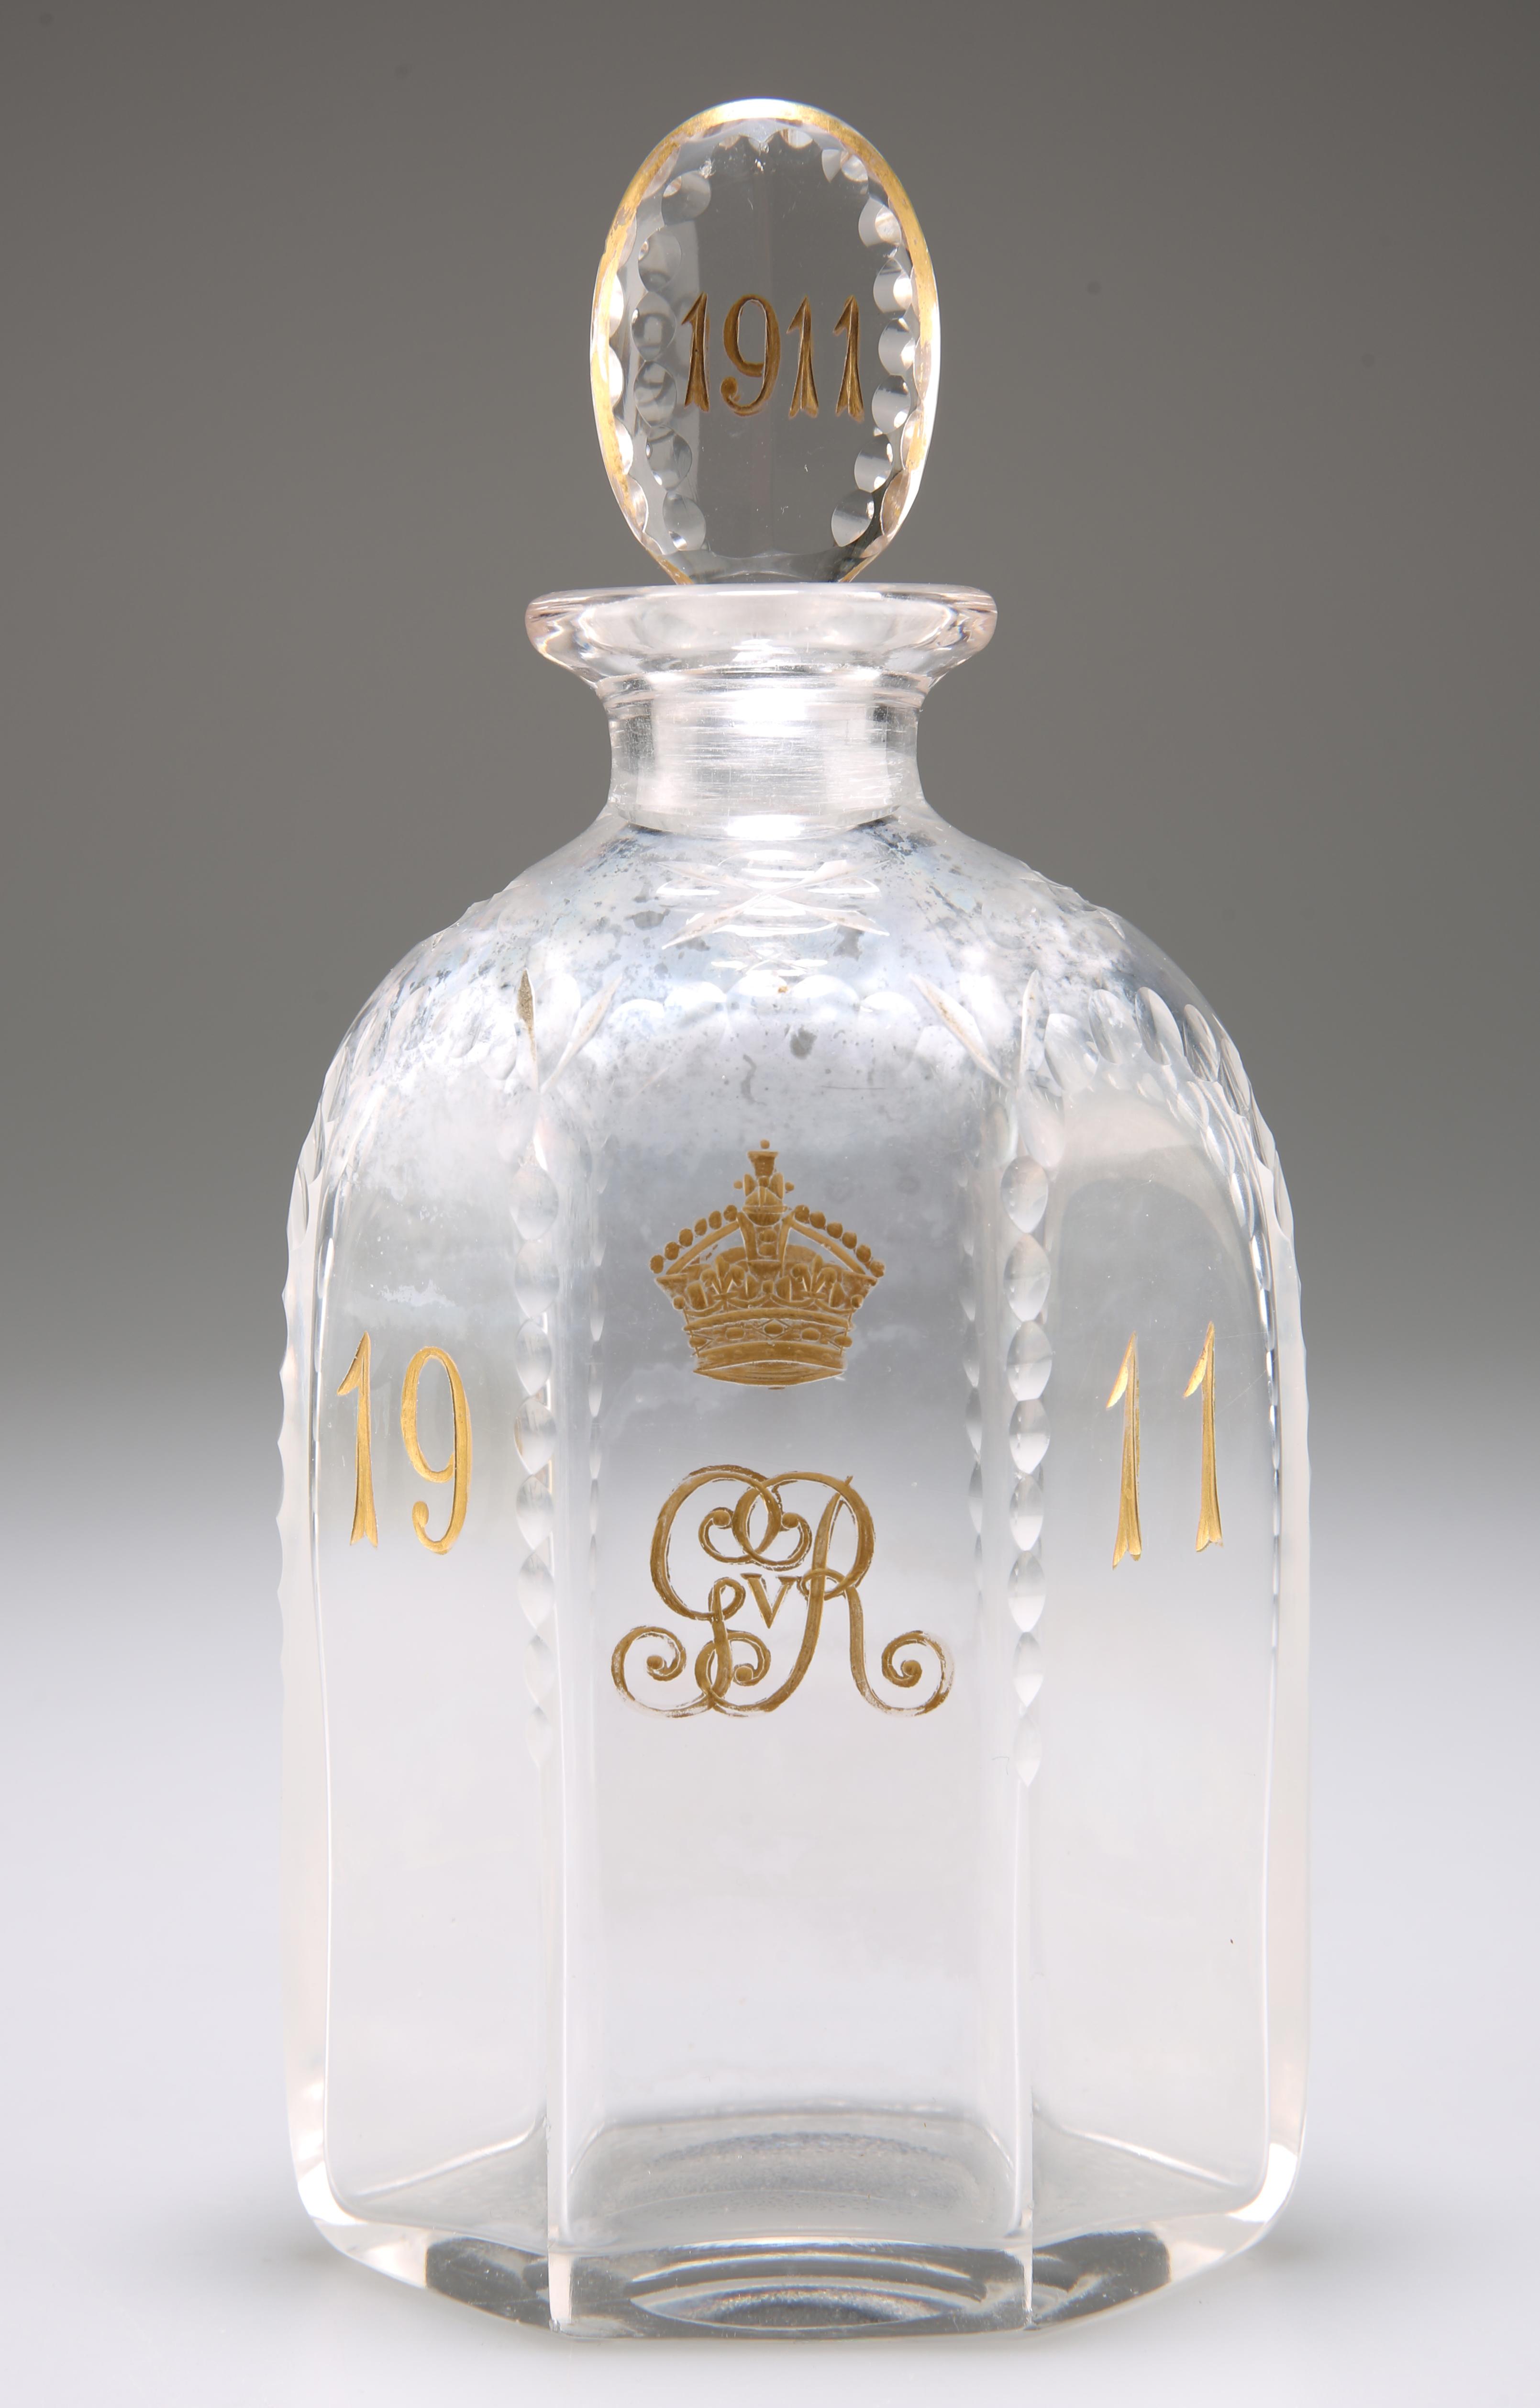 A GEORGE V GLASS CORONATION DECANTER